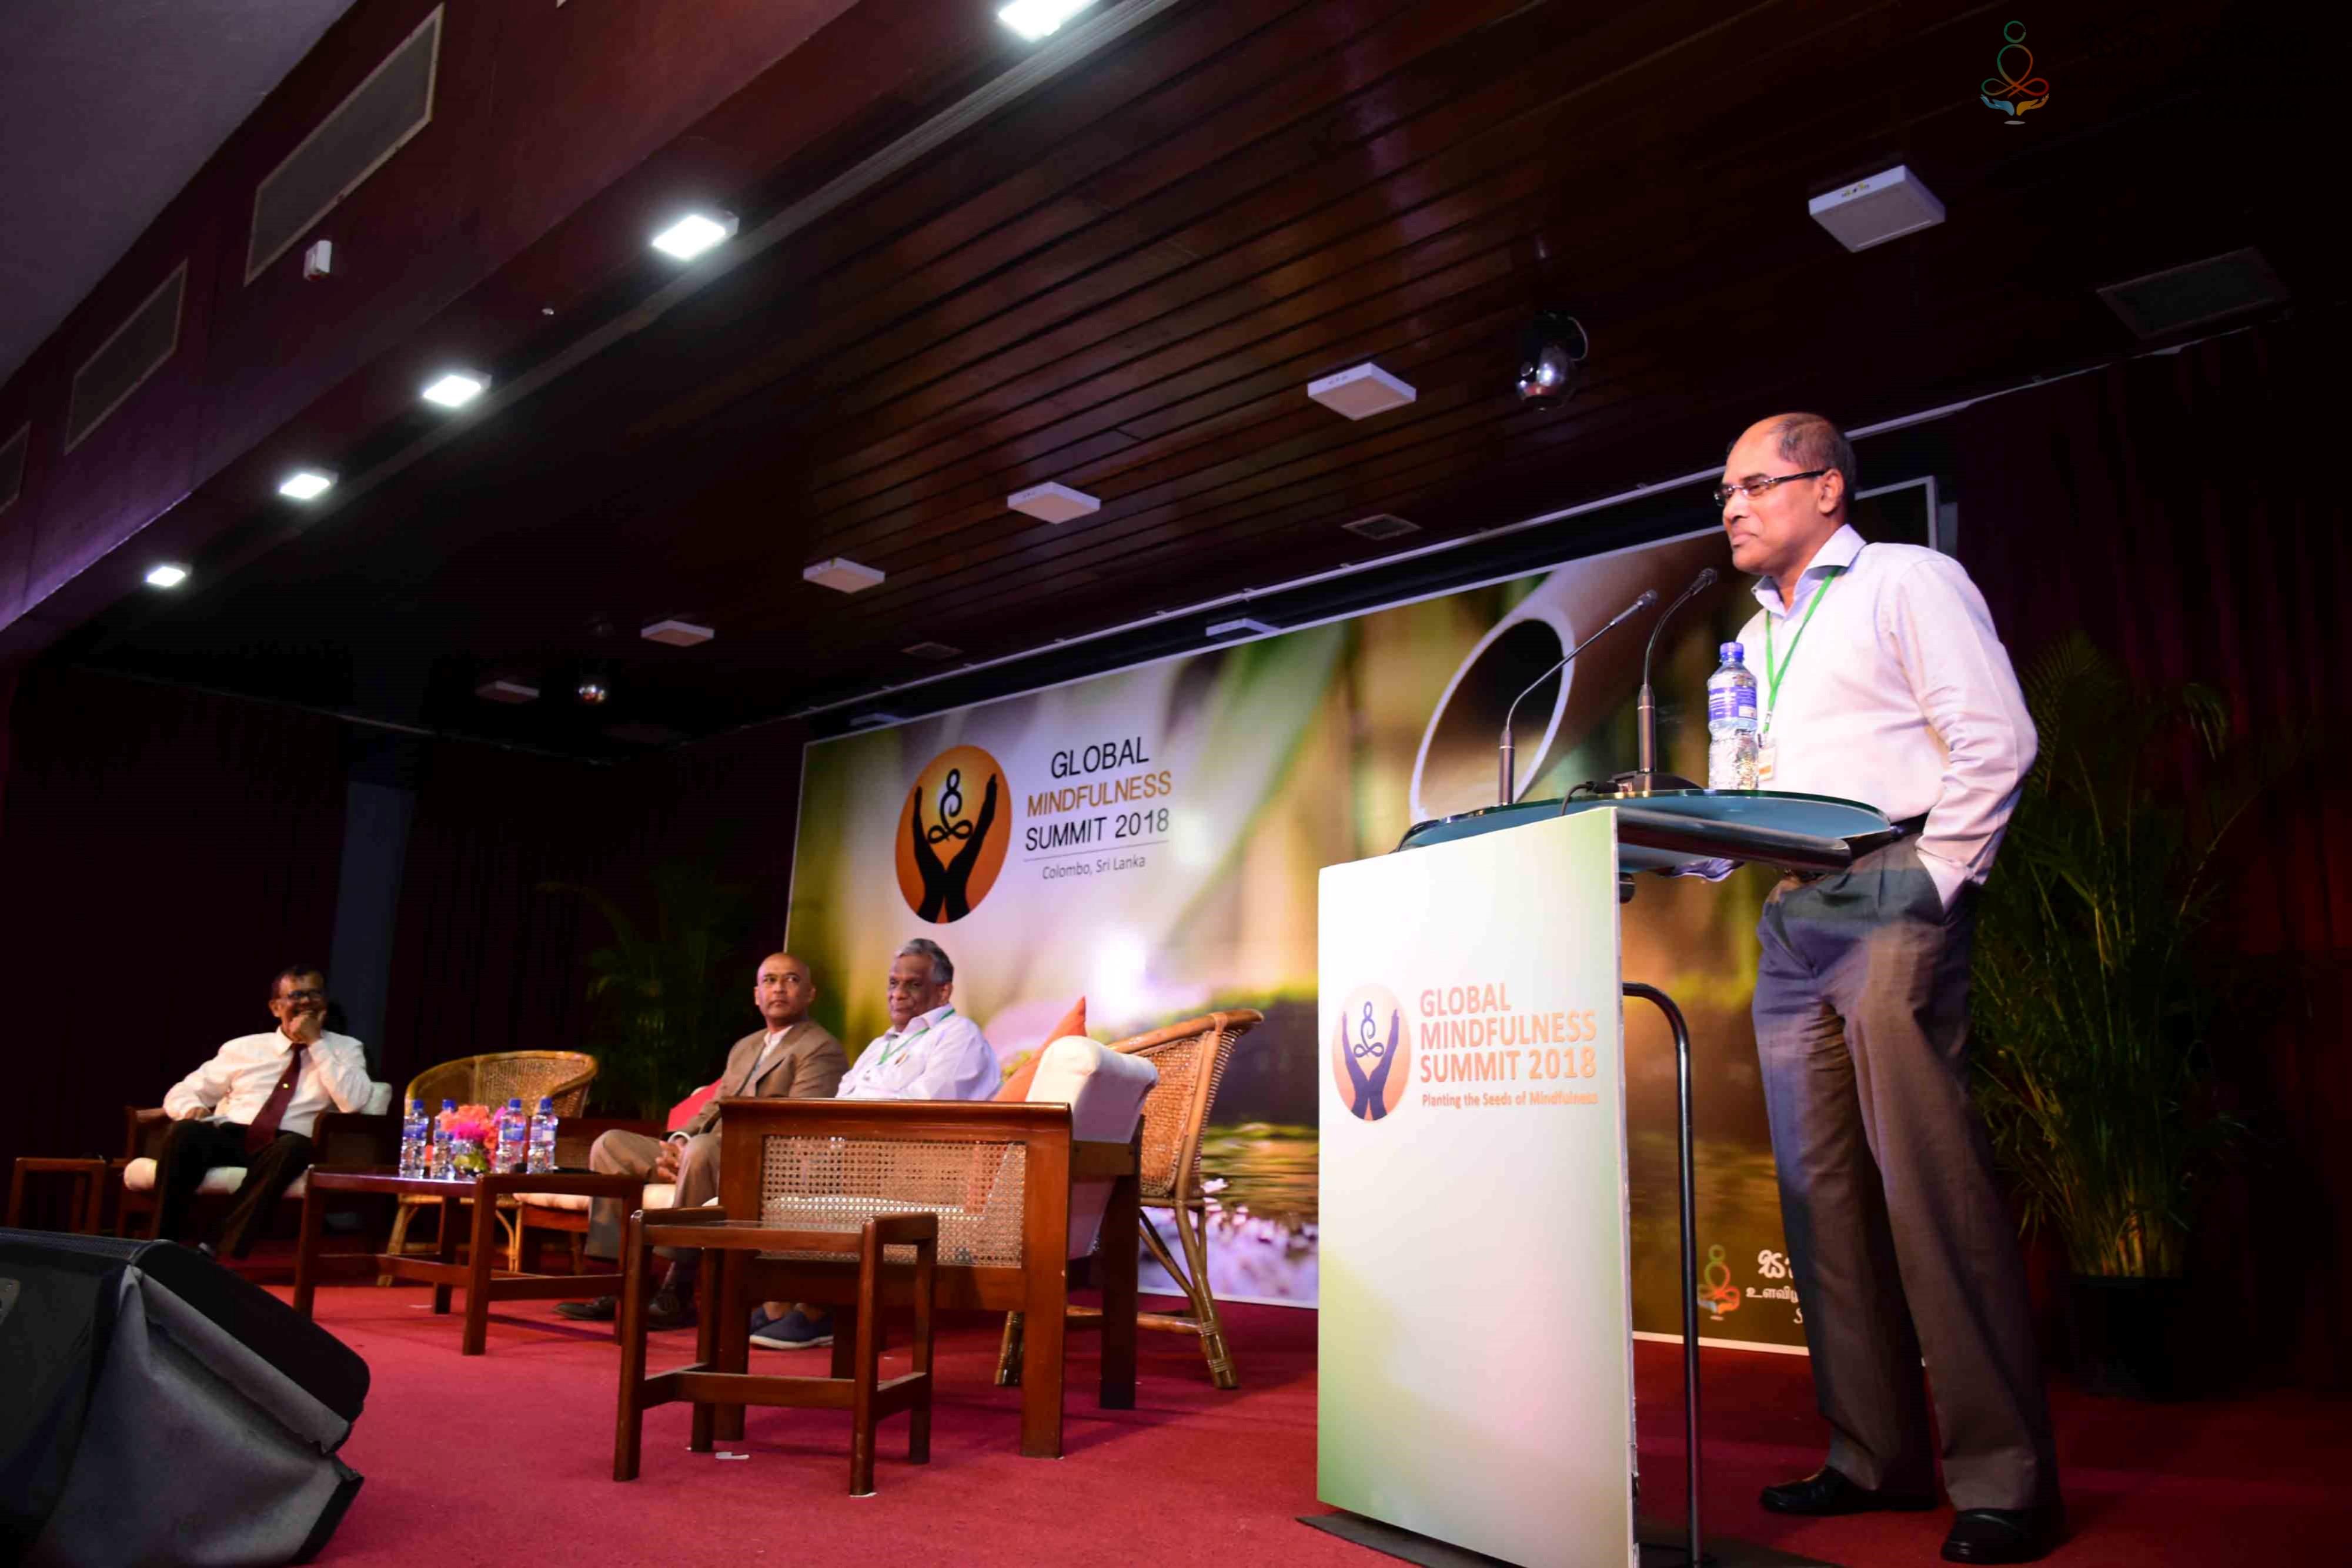 Global Mindfulness Summit 2018 - Day1 (39)